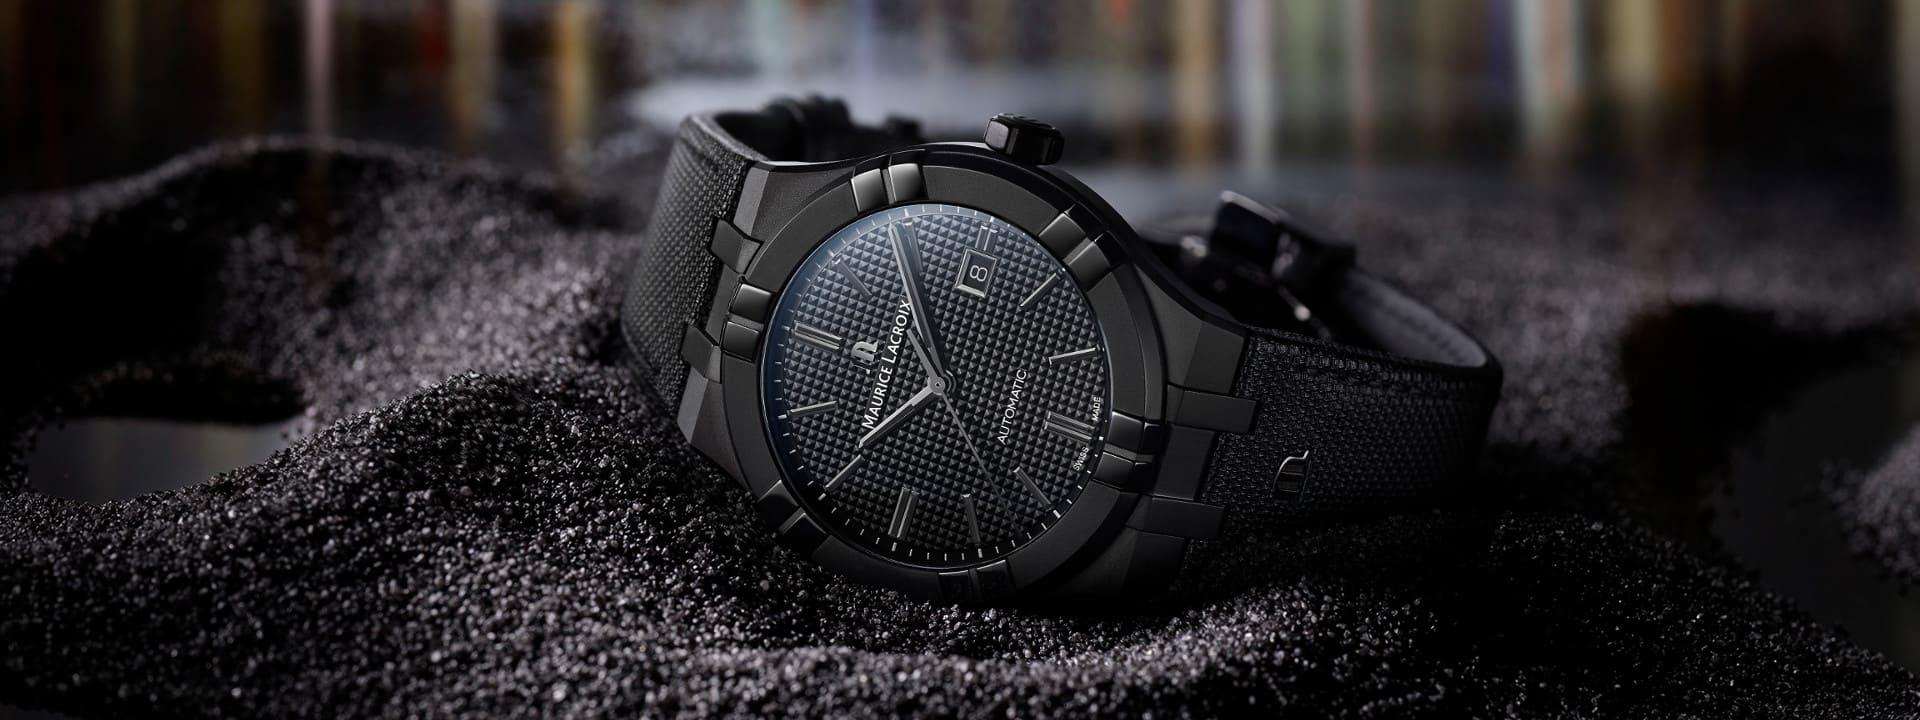 Maurice Lacroix Aikon Uhren